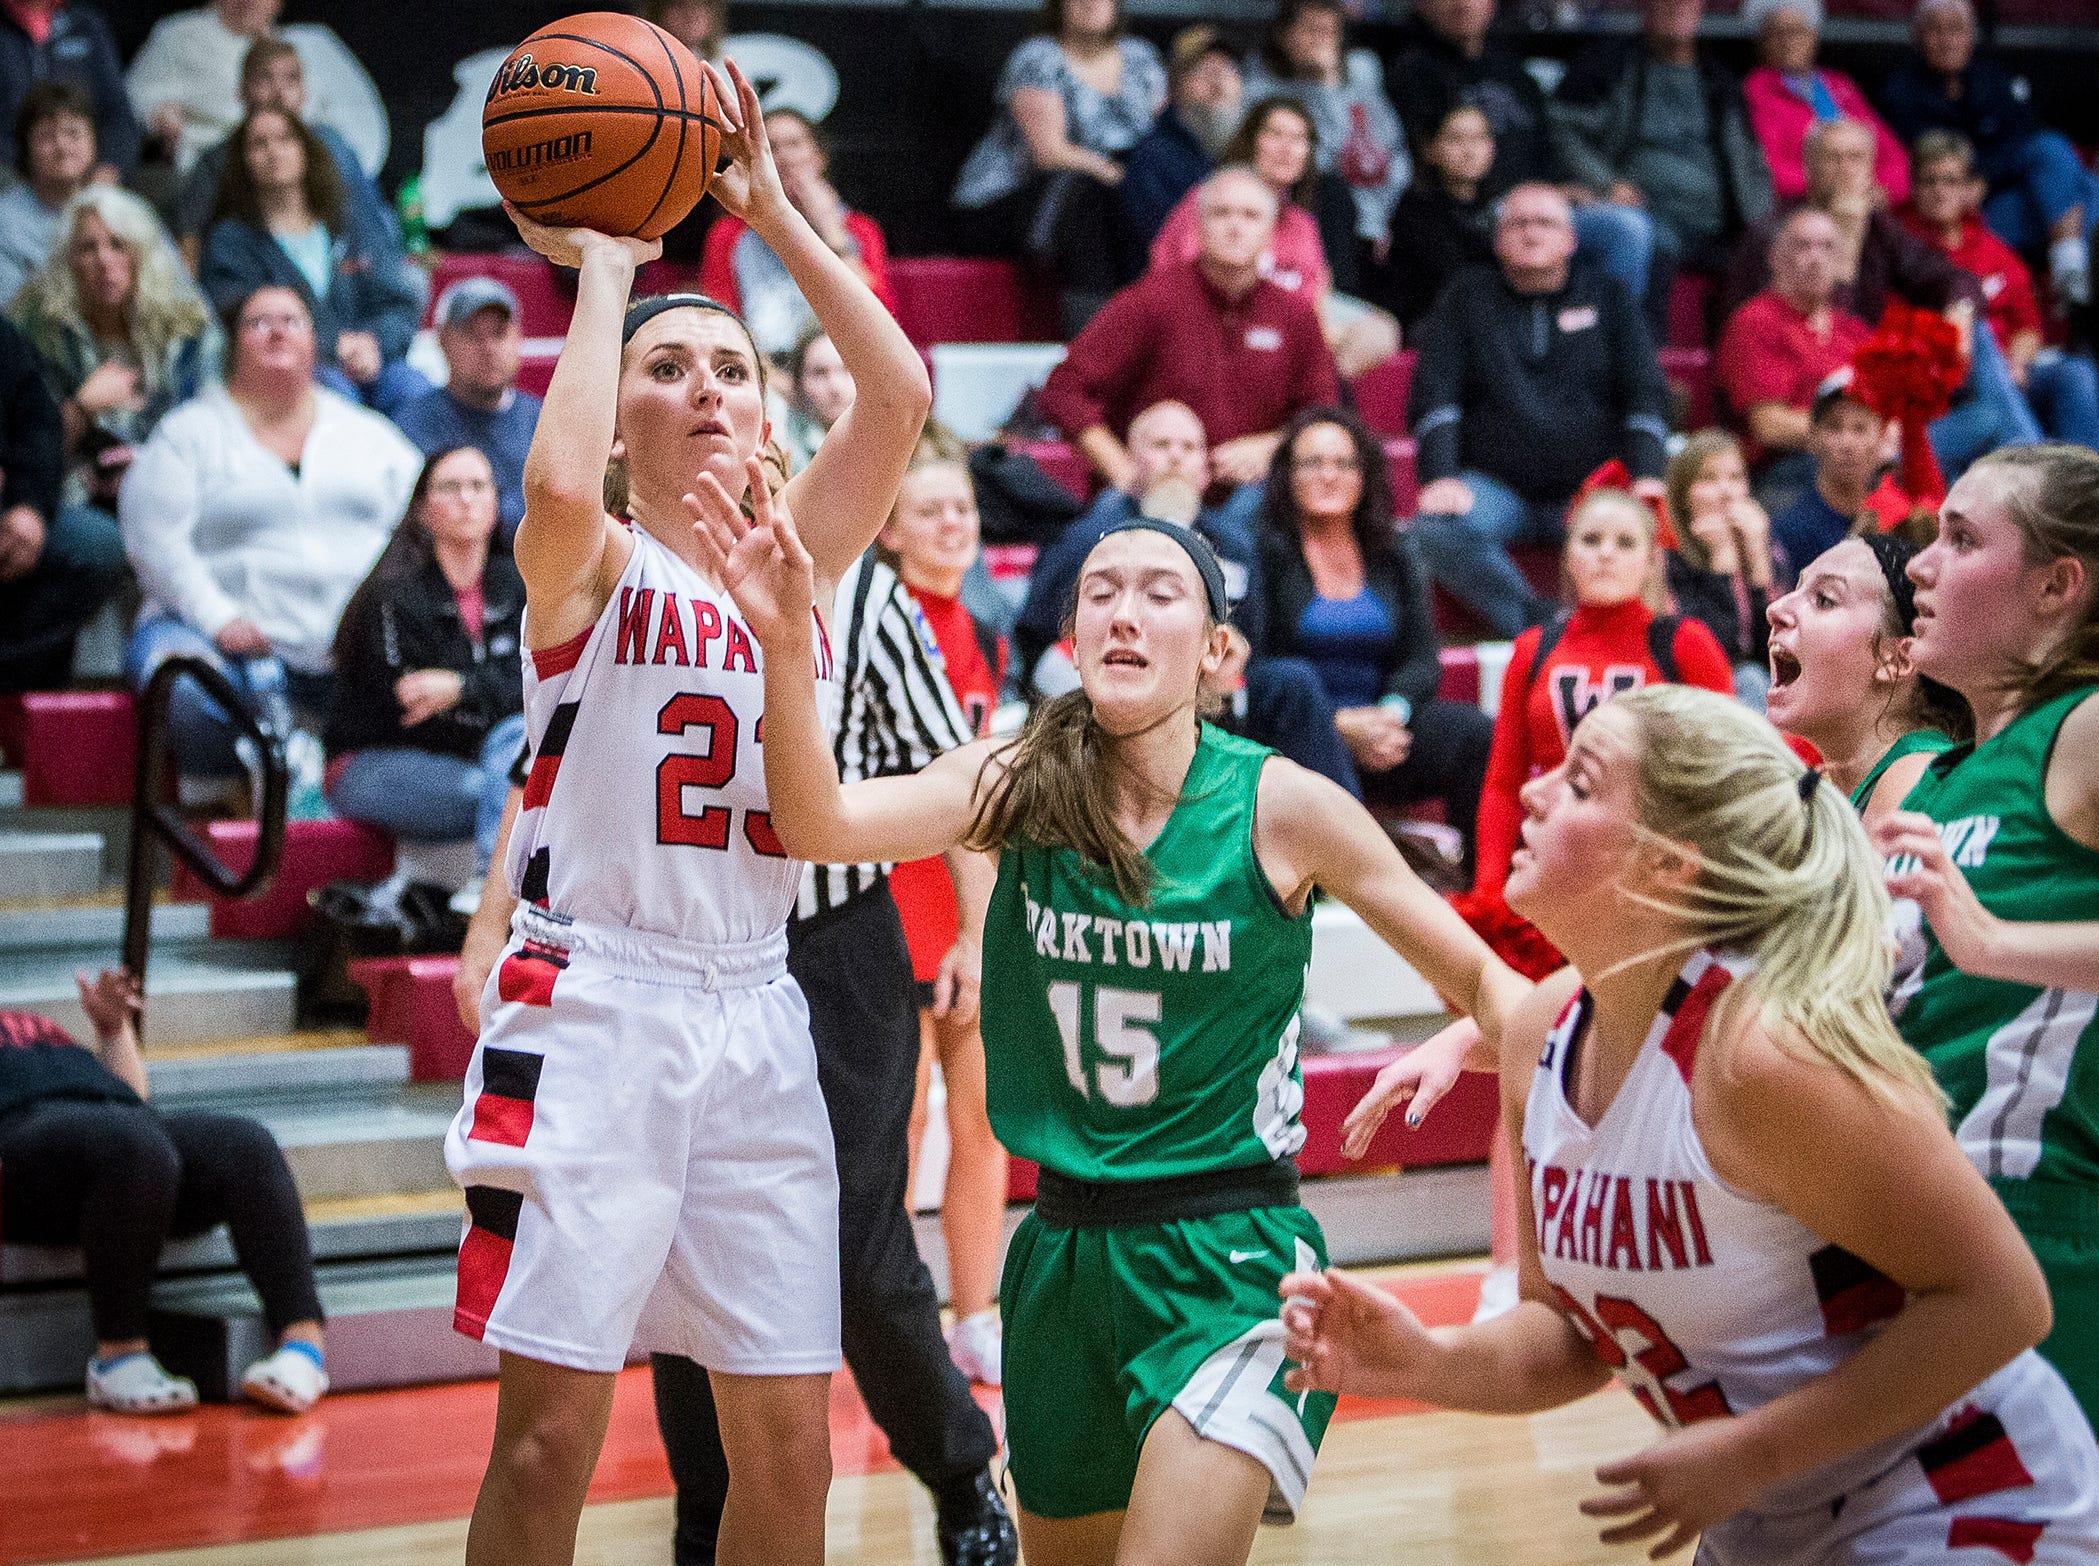 Wapahani's Carlie Boggs shoots against Yorktown's defense during their game at Wapahani High School Tuesday, Dec. 4, 2018.